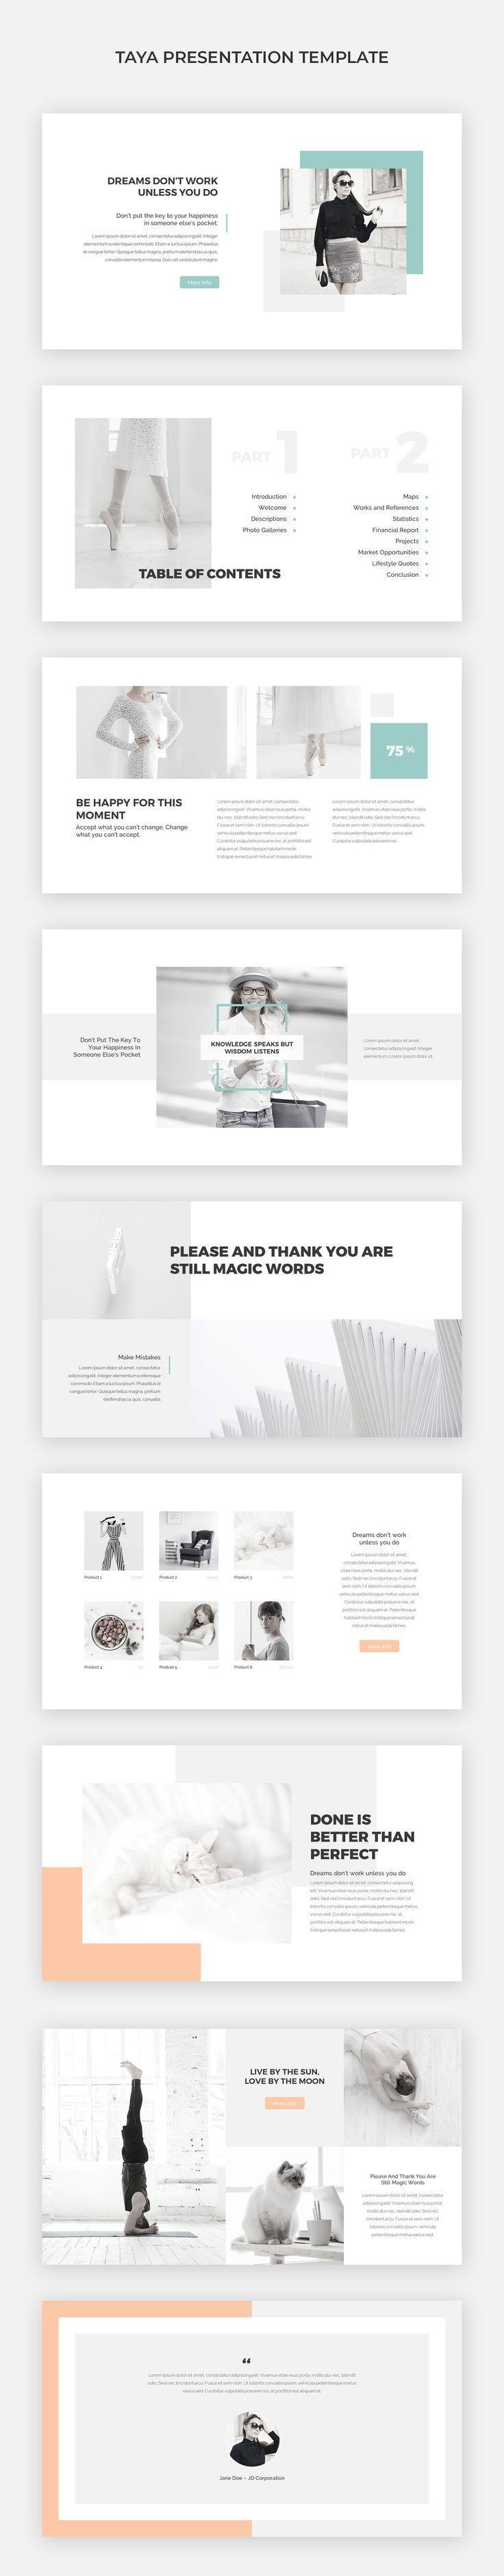 simple presentation template architecture